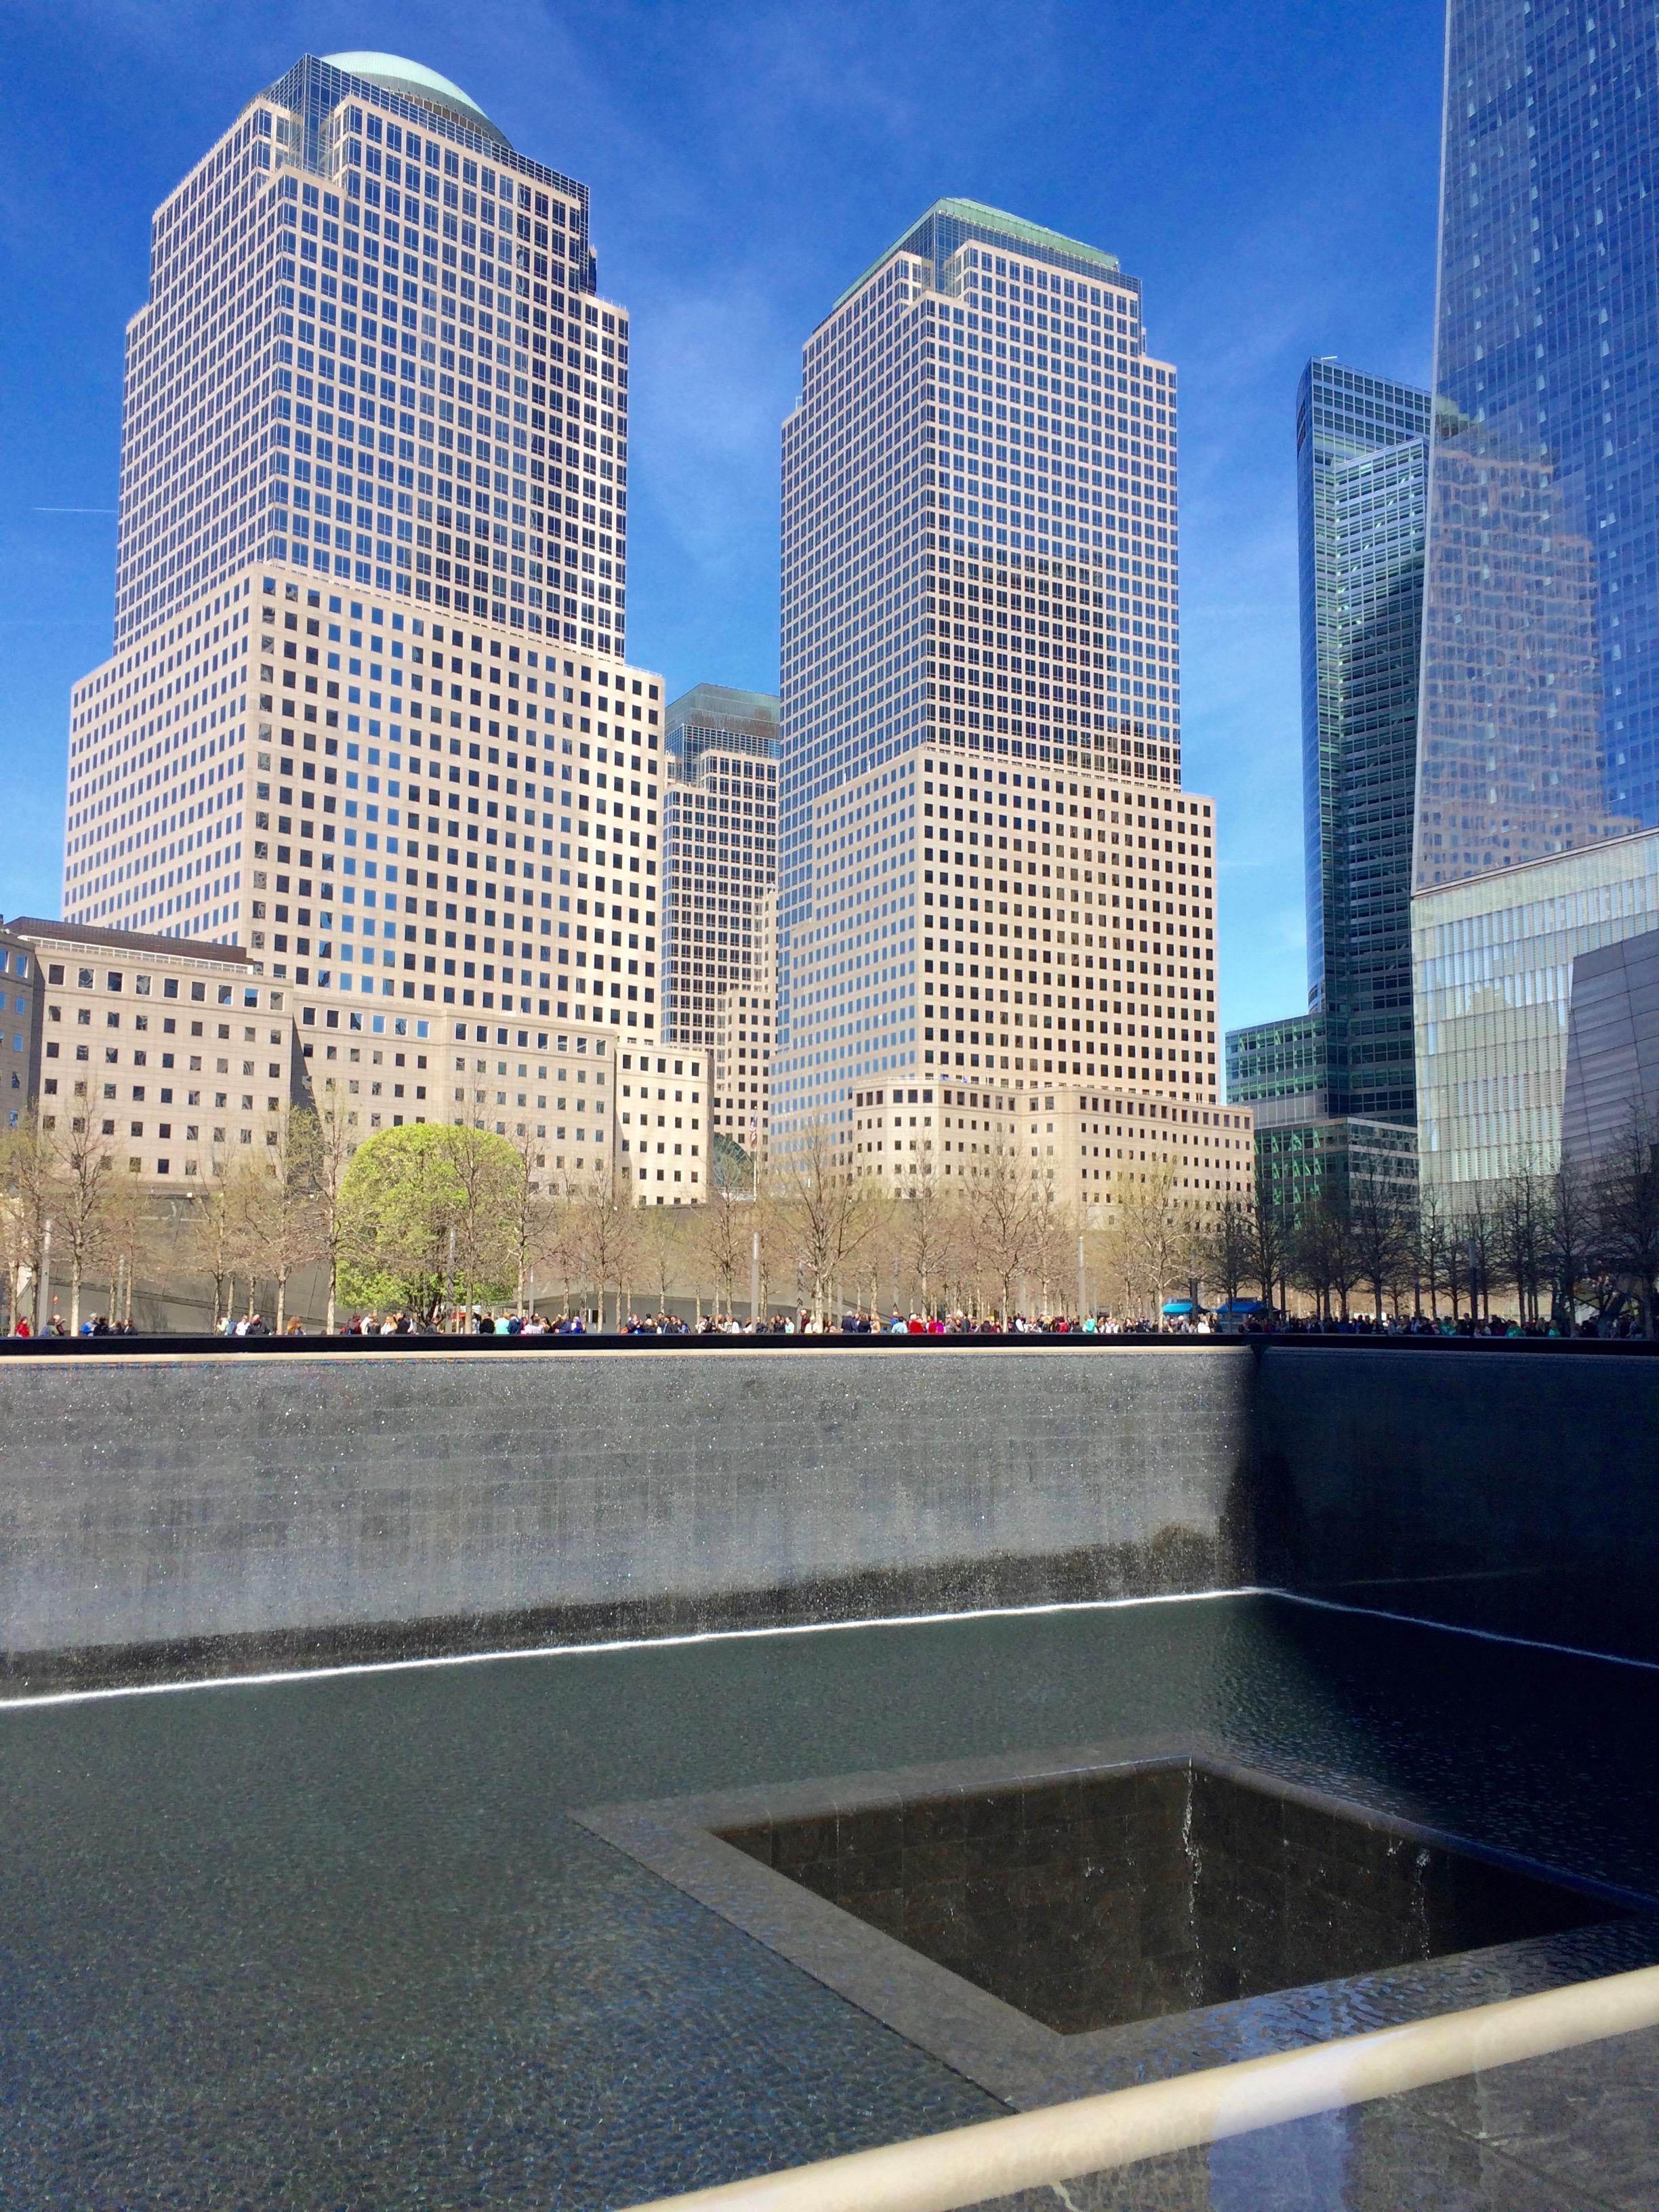 9/11-monumentti.